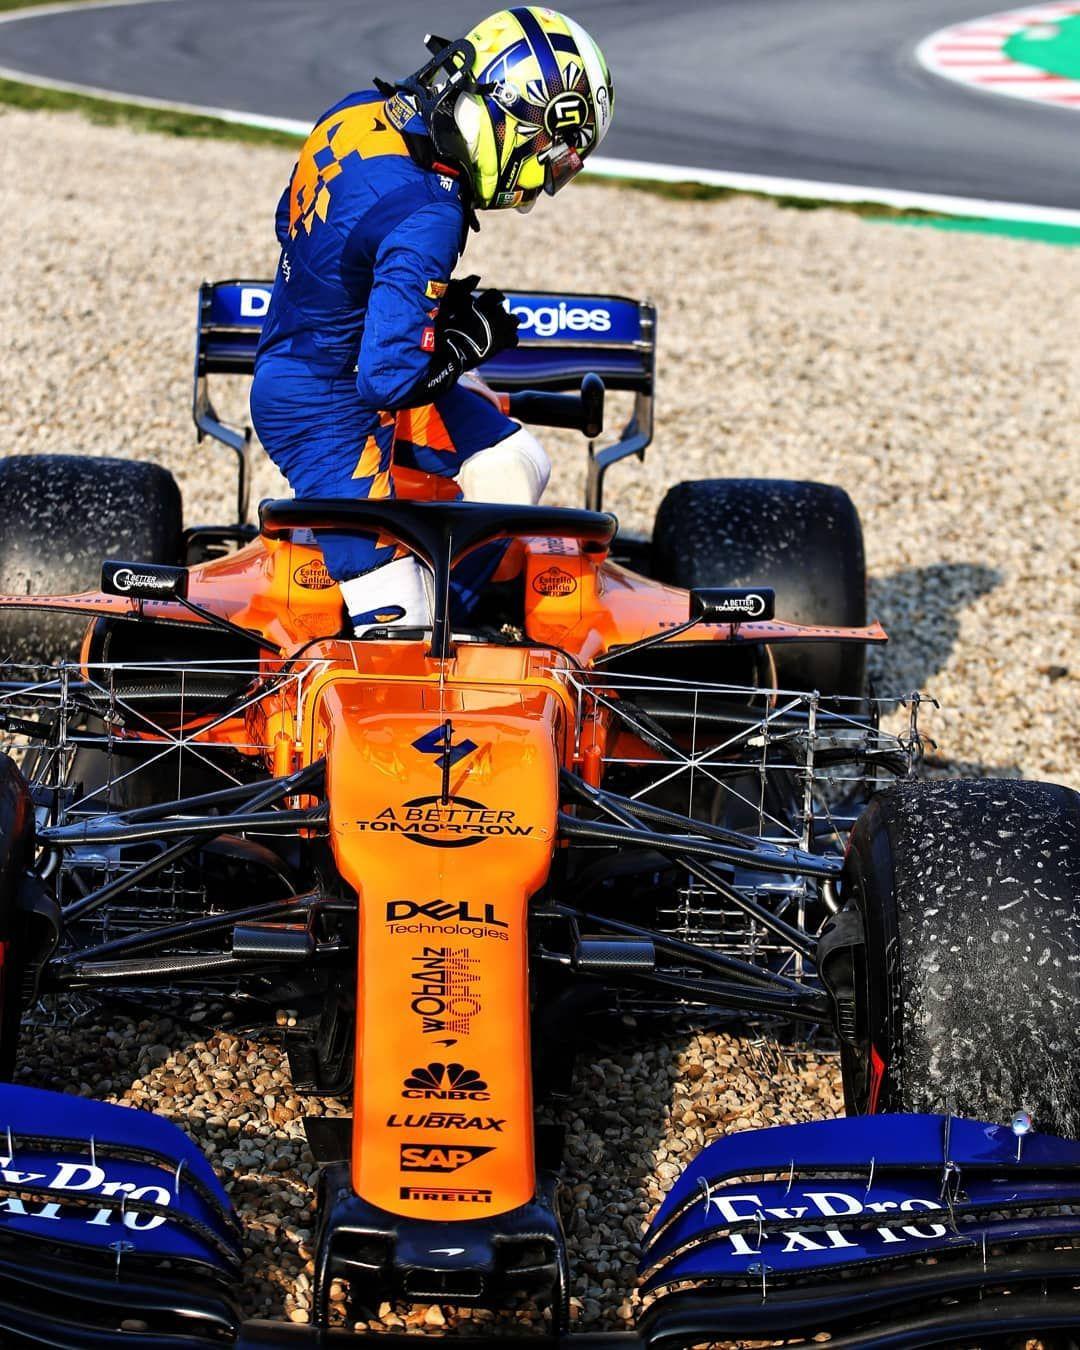 Mclaren Formula 1 2019 Wallpaper 1080x1350